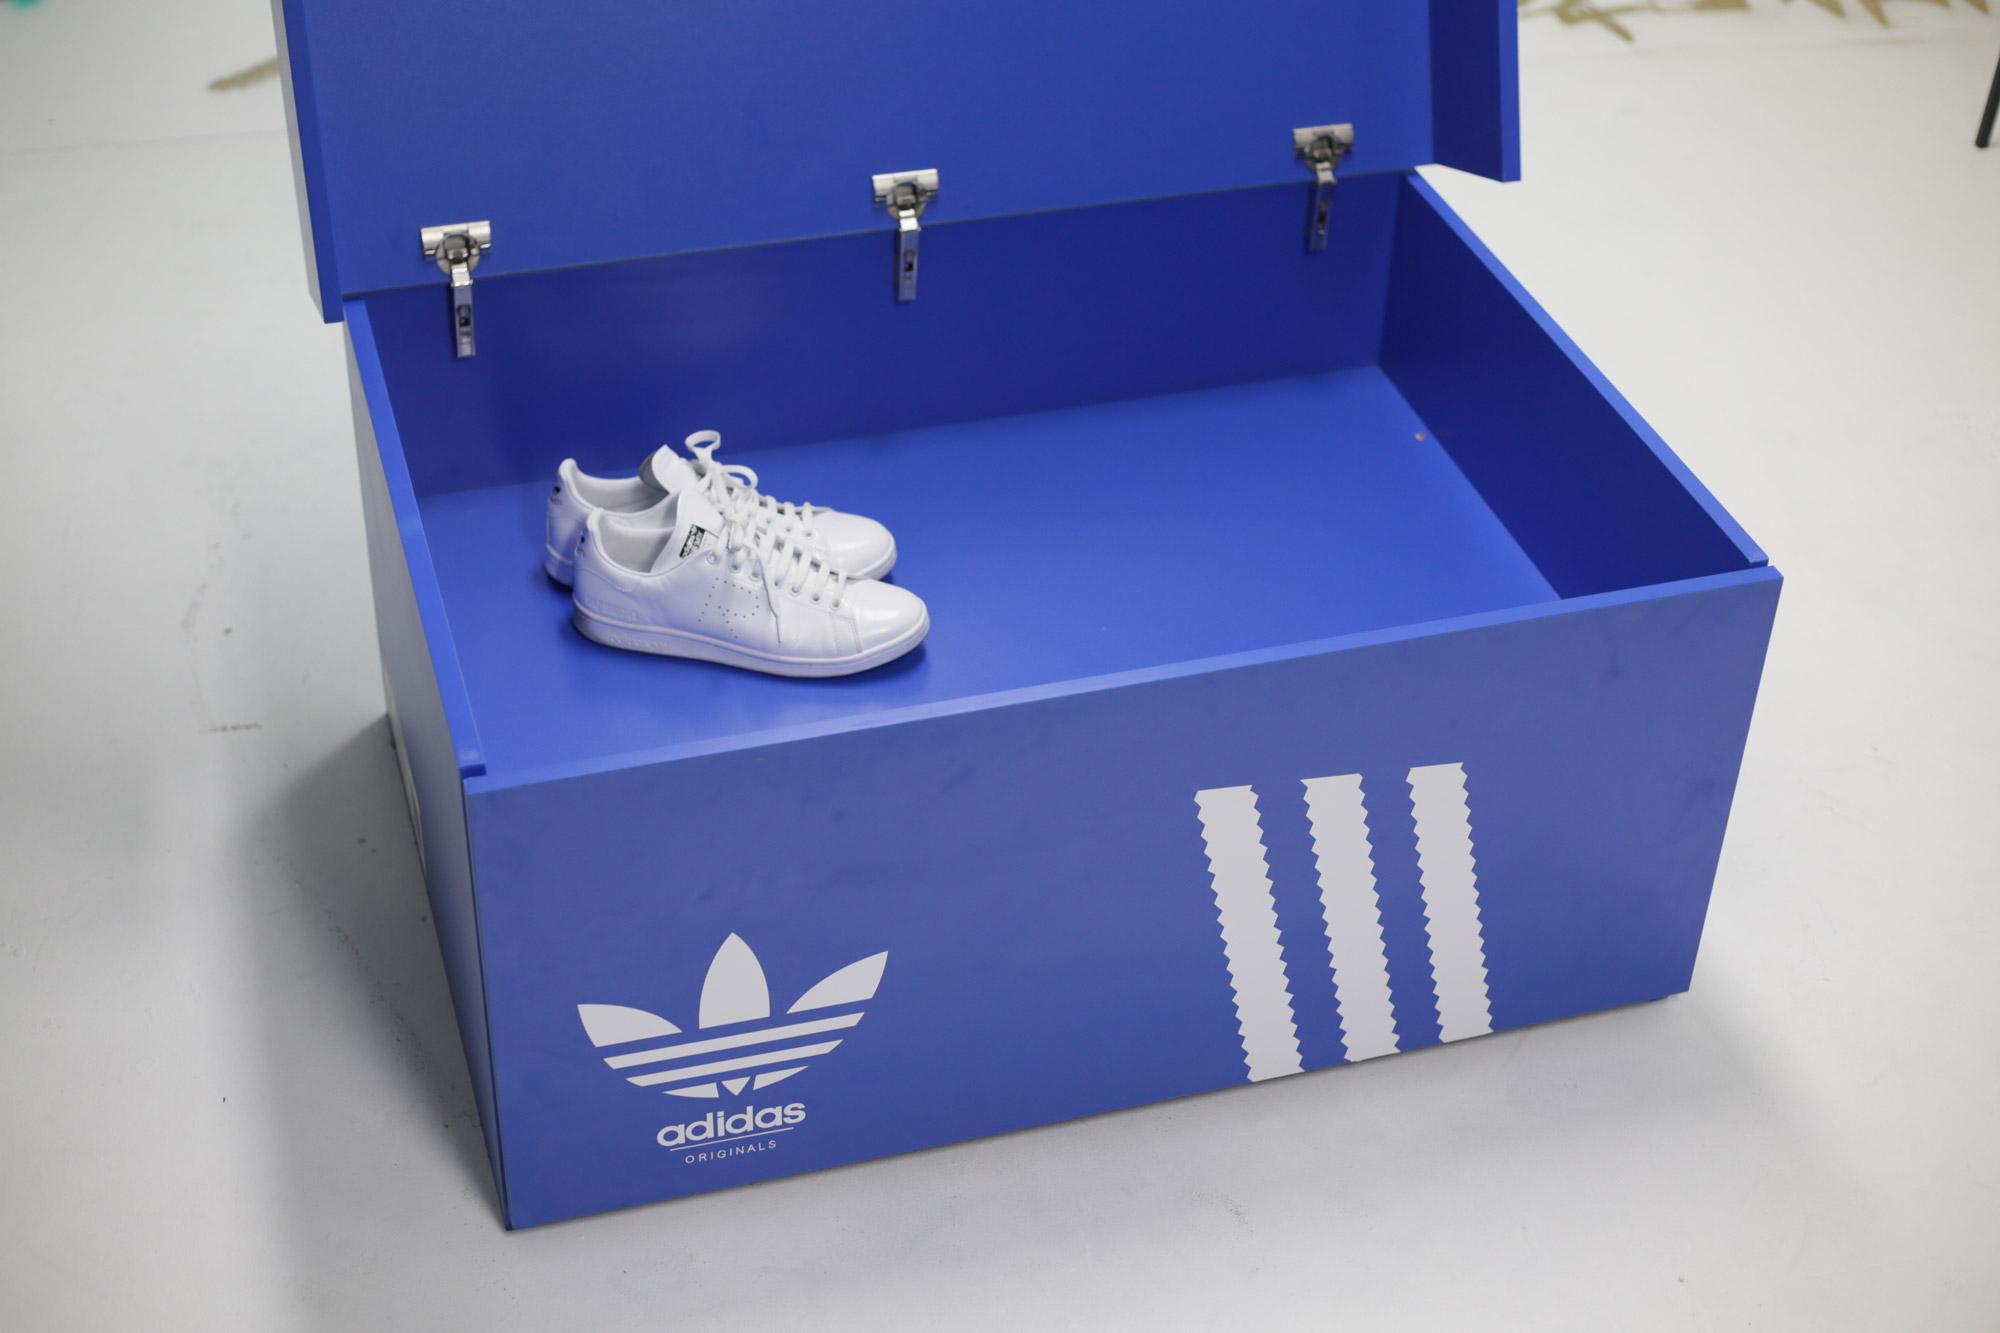 Adidas Shoebox Shop mega adidas shoebox — forty culture